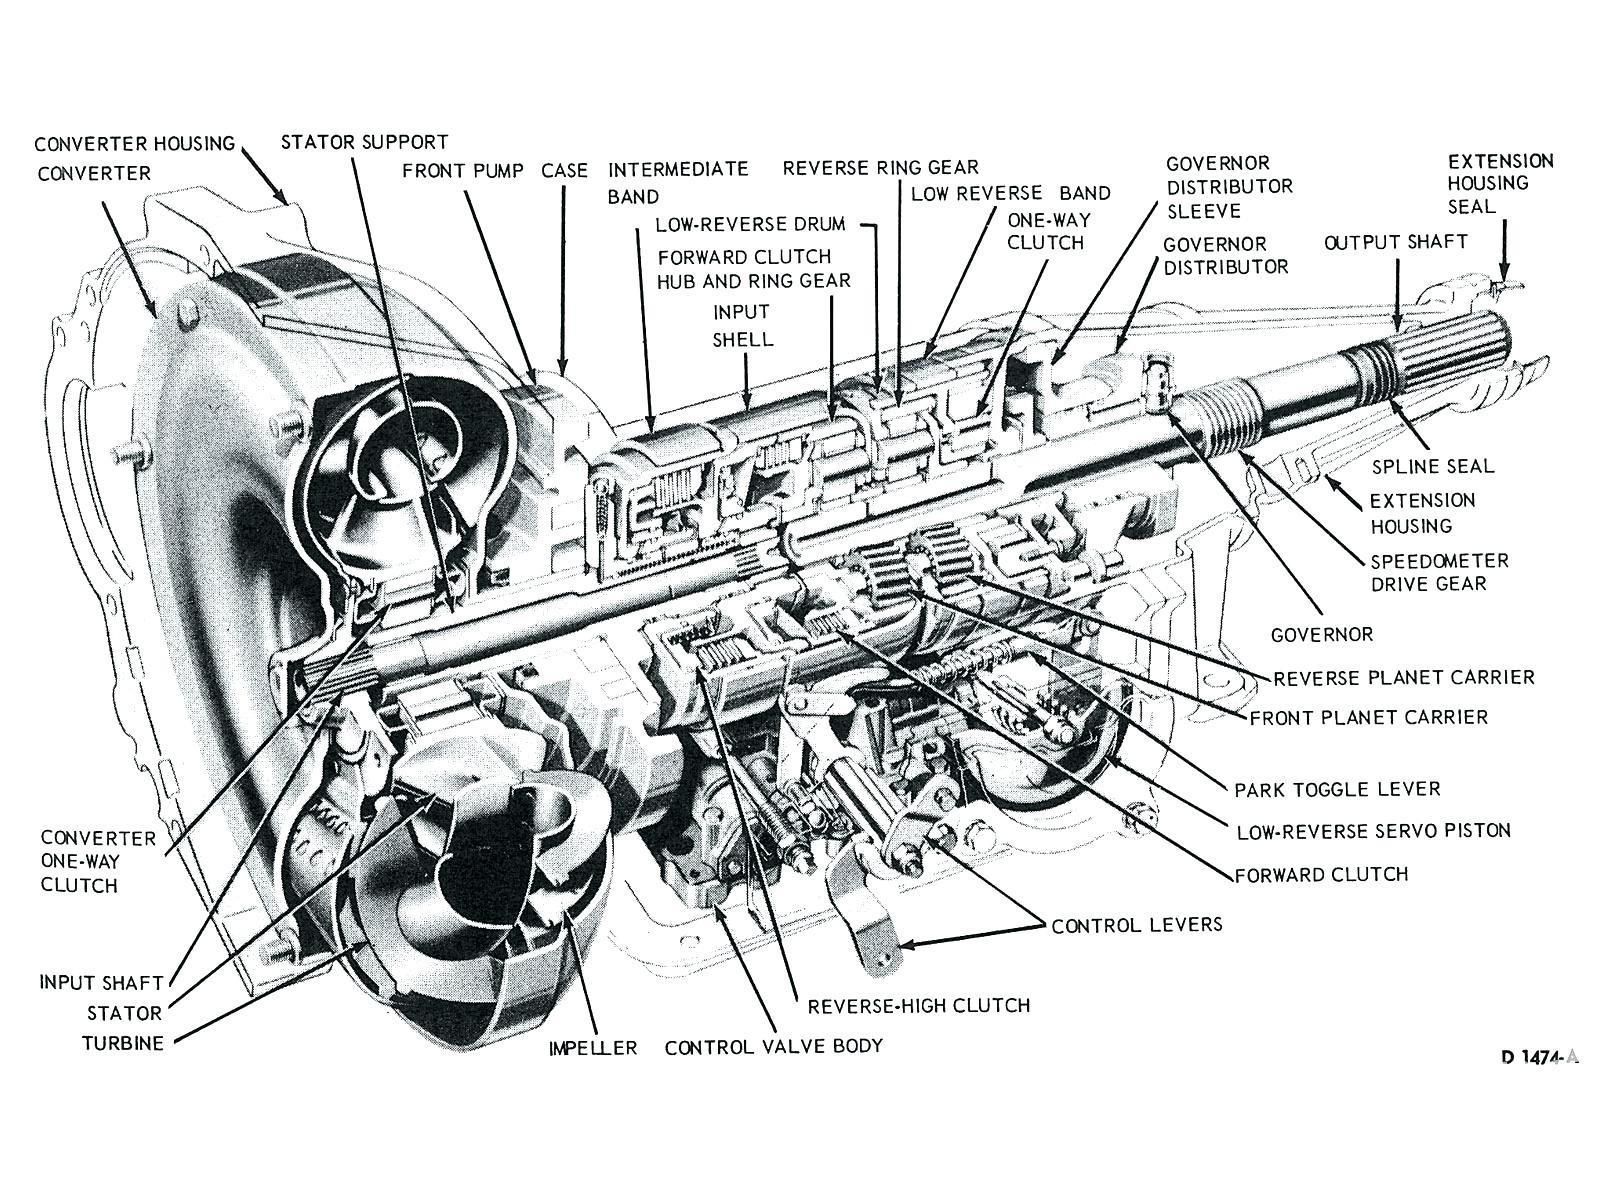 Single Cylinder Motorcycle Engine Diagram 4 Cylinder Diesel Engine Diagram Horse Car Wiring Library Expansion Of Single Cylinder Motorcycle Engine Diagram